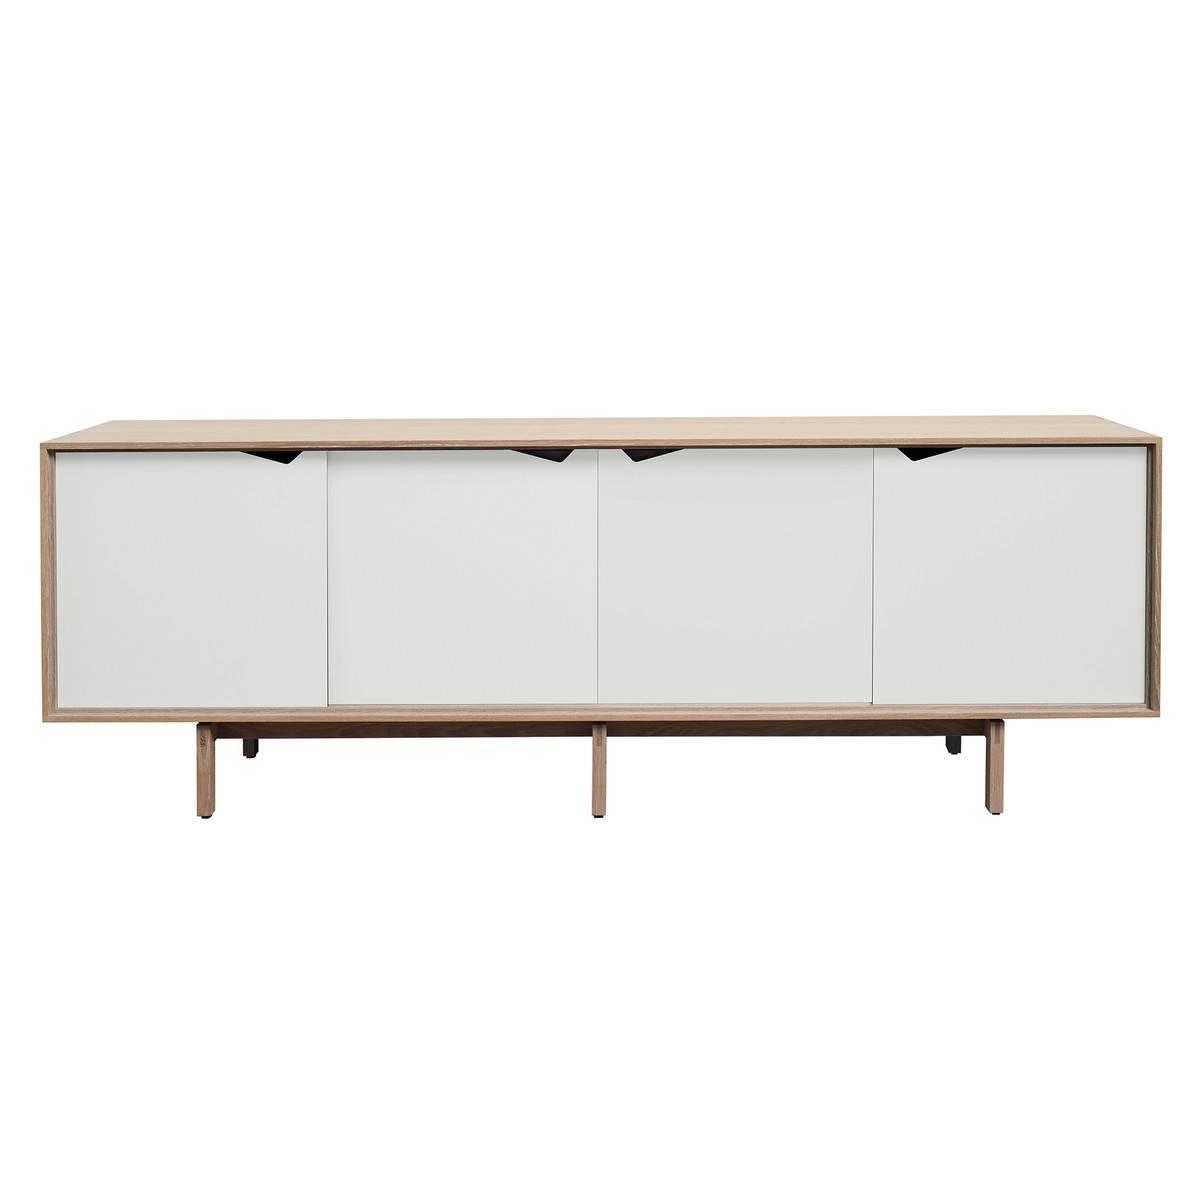 S1 Sideboard Unicolouredandersen Furniture for White Sideboard Furniture (Image 19 of 30)